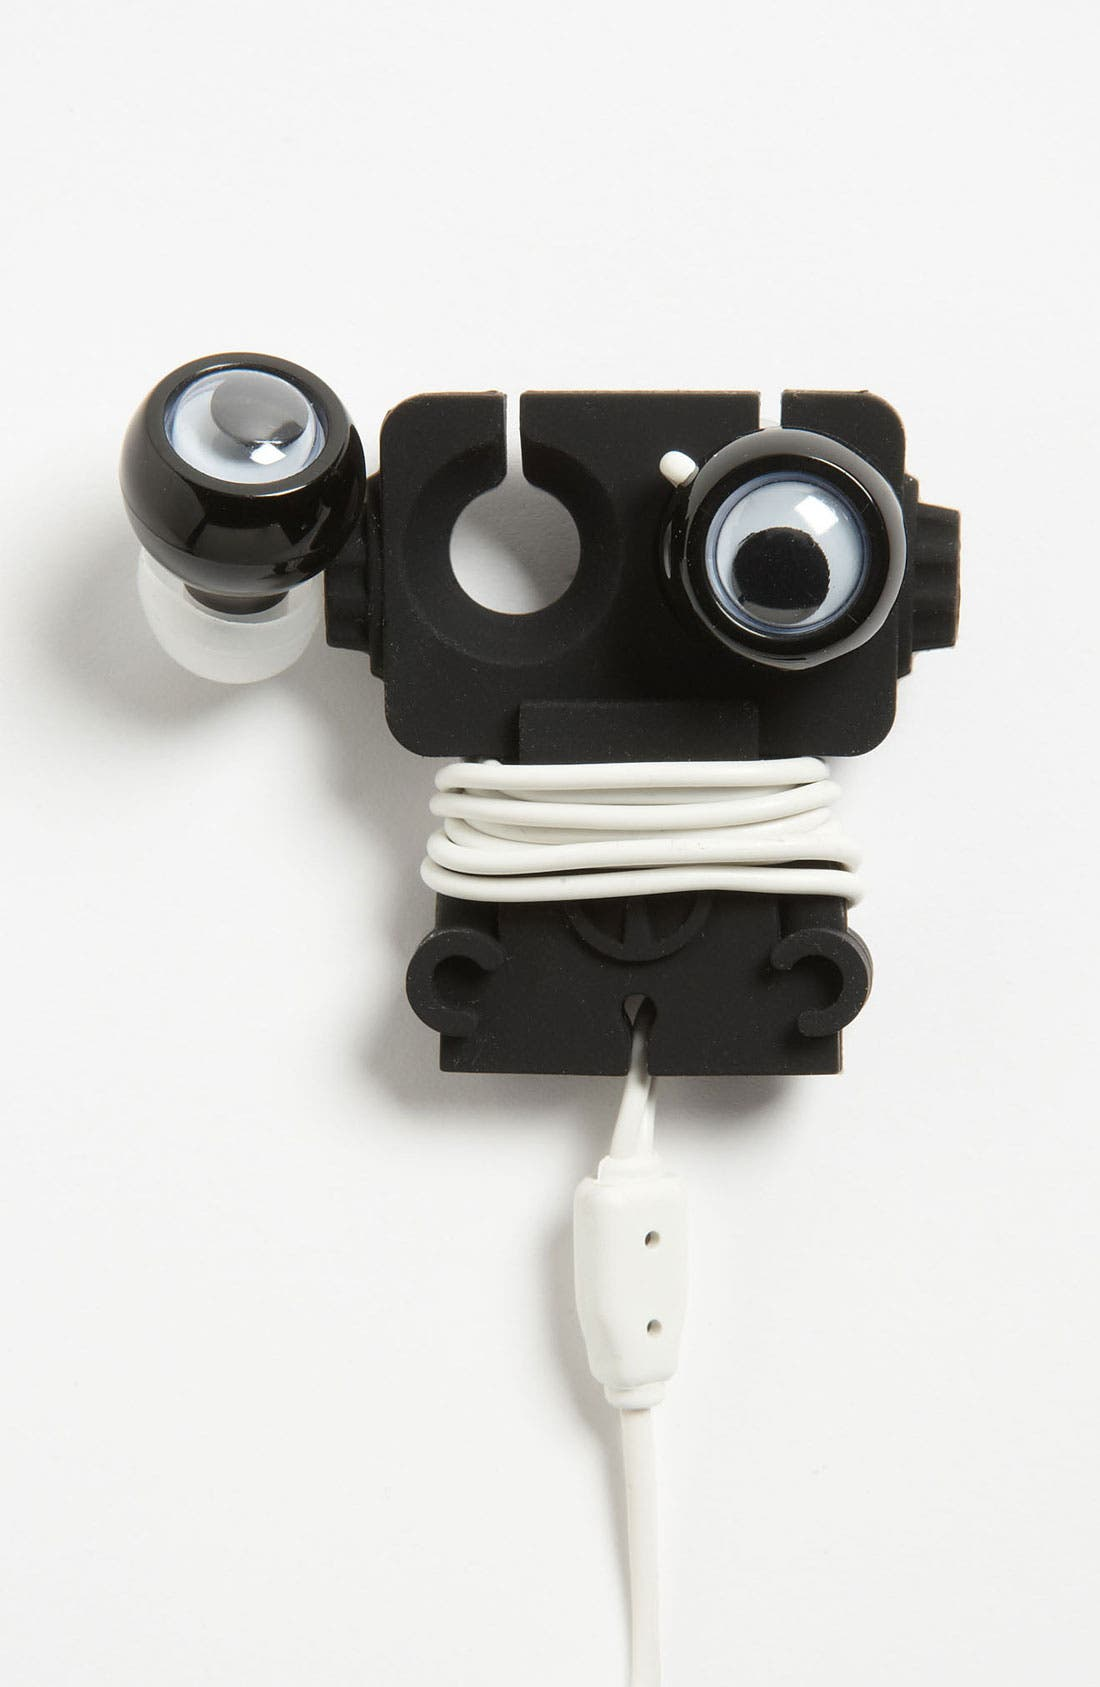 Main Image - Kikkerland Design 'Robo Buddy' Earbuds & Cord Wrap